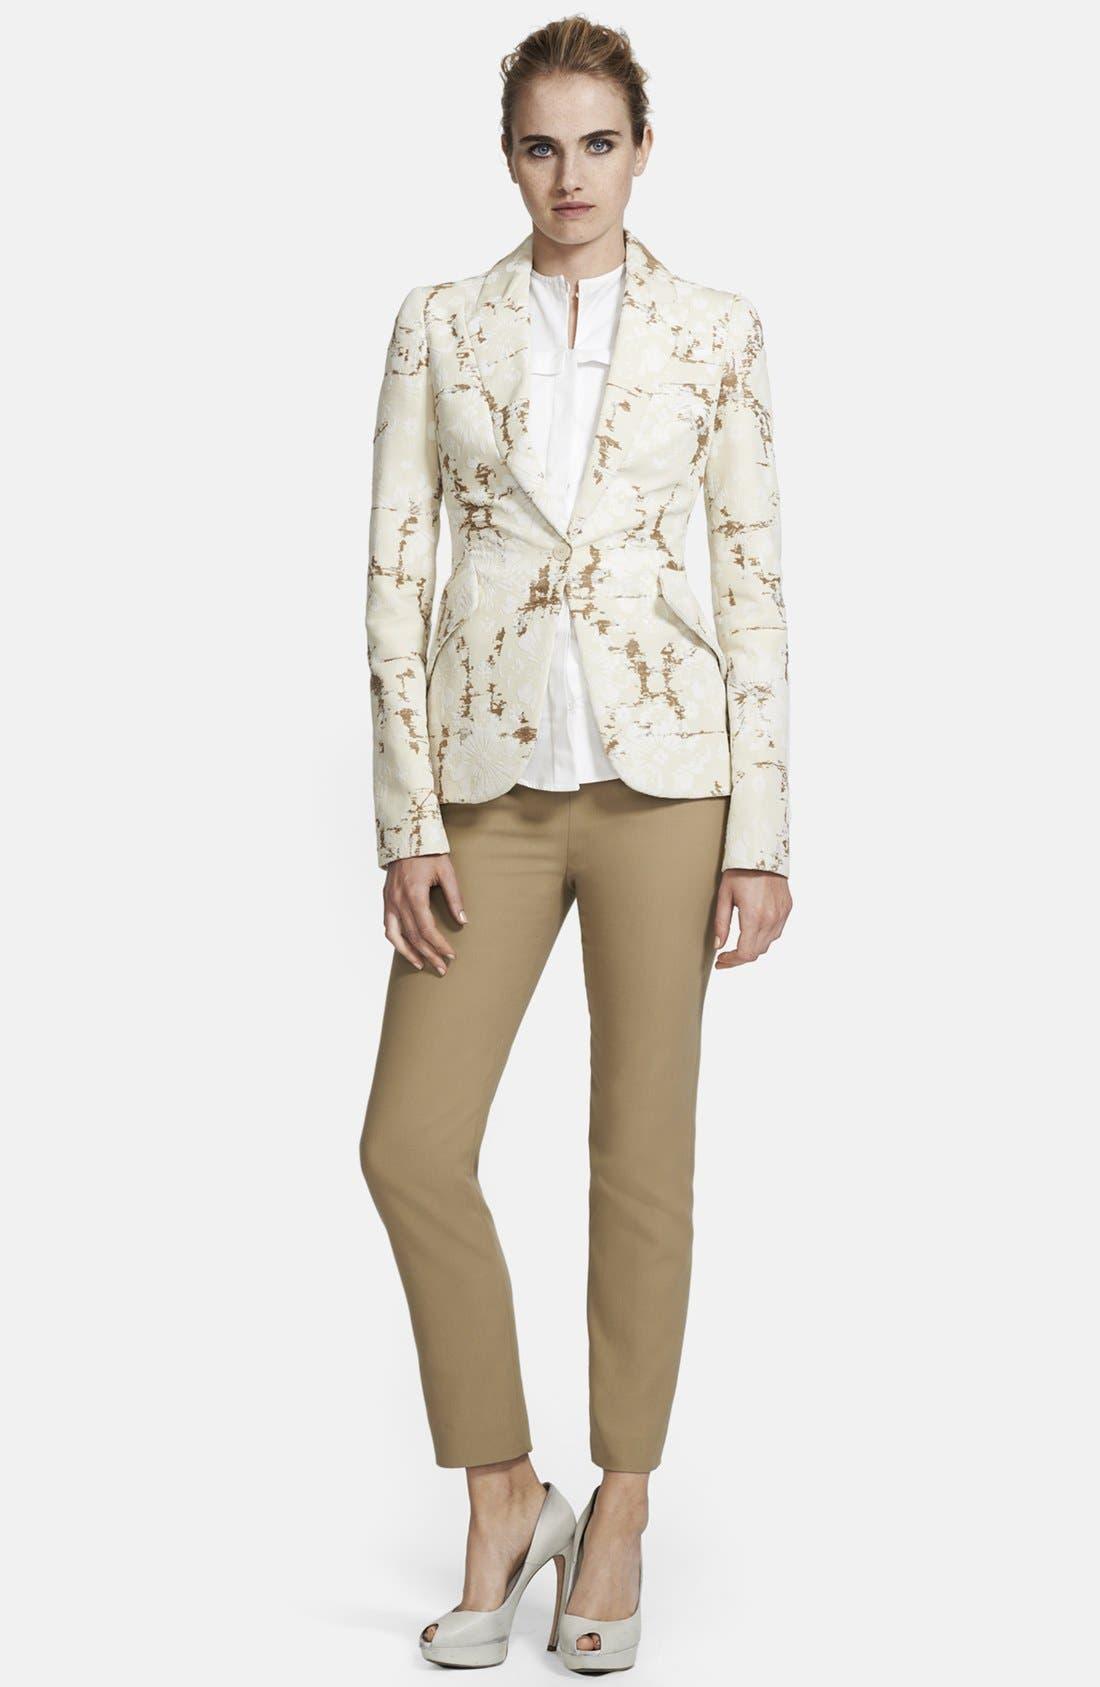 Main Image - Alexander McQueen Flocked Cotton Jacquard Blazer